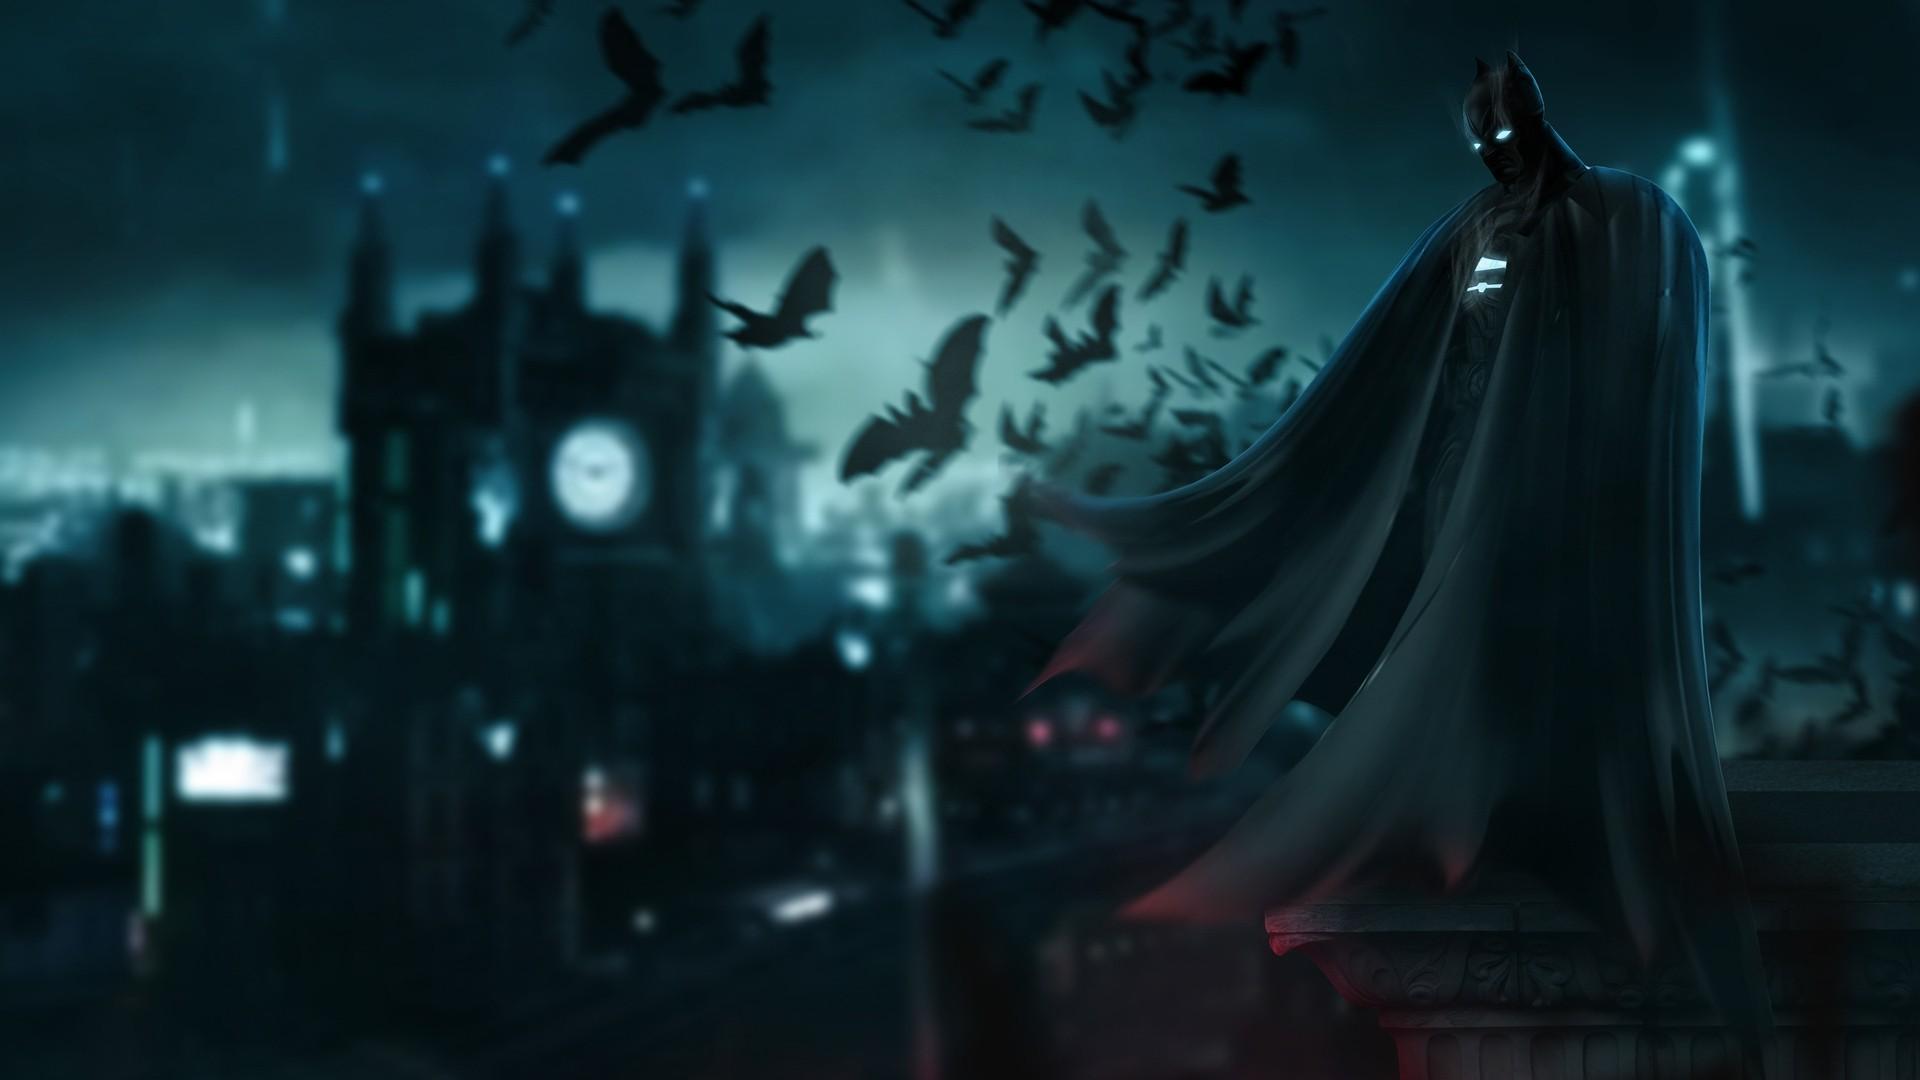 Batman Art Desktop Wallpaper